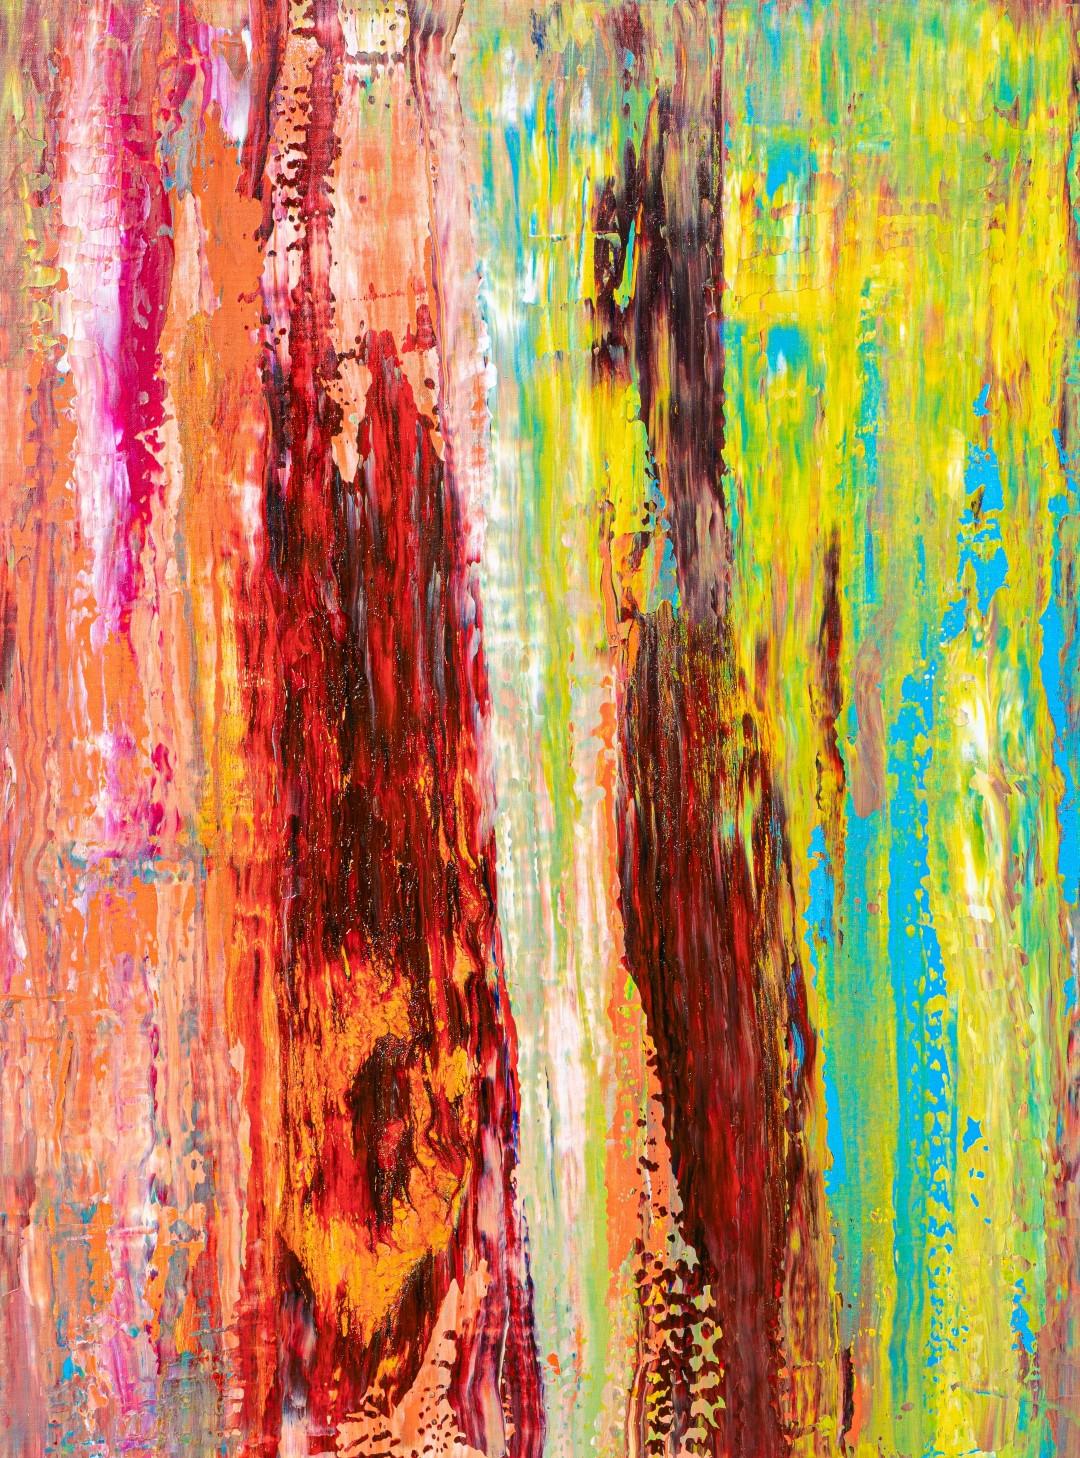 SHAMANIC VISION - 2019Acrylic & mixed media48 x 36 inches£725